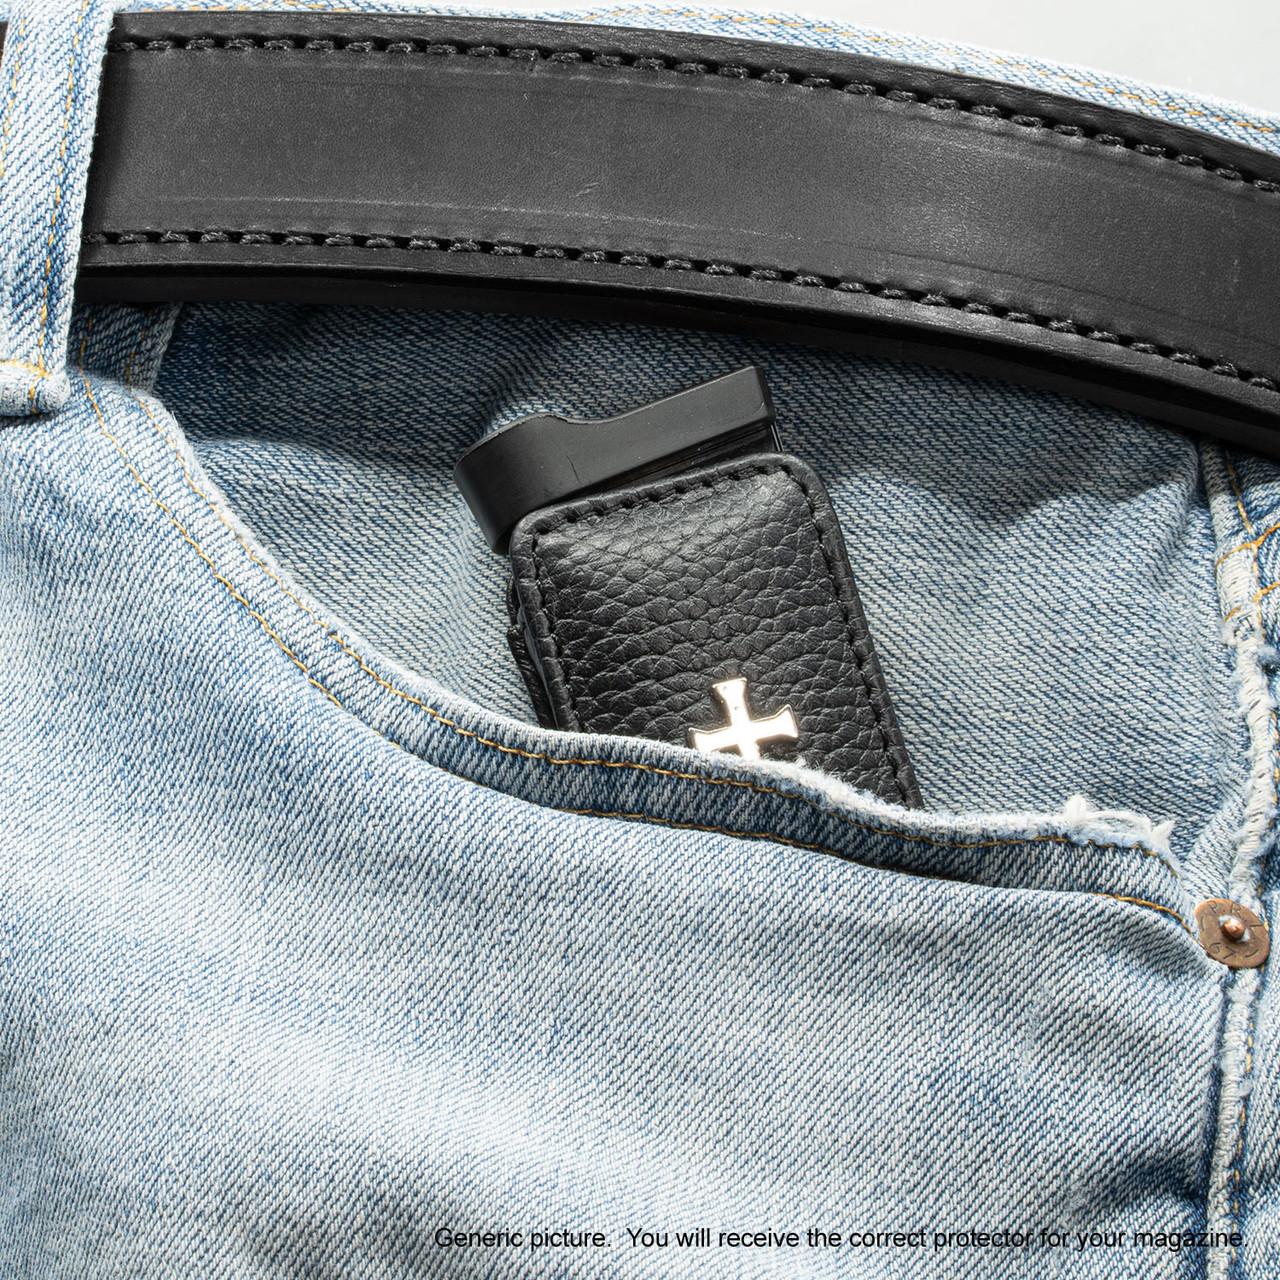 Glock 43X Black Leather Cross Magazine Pocket Protector